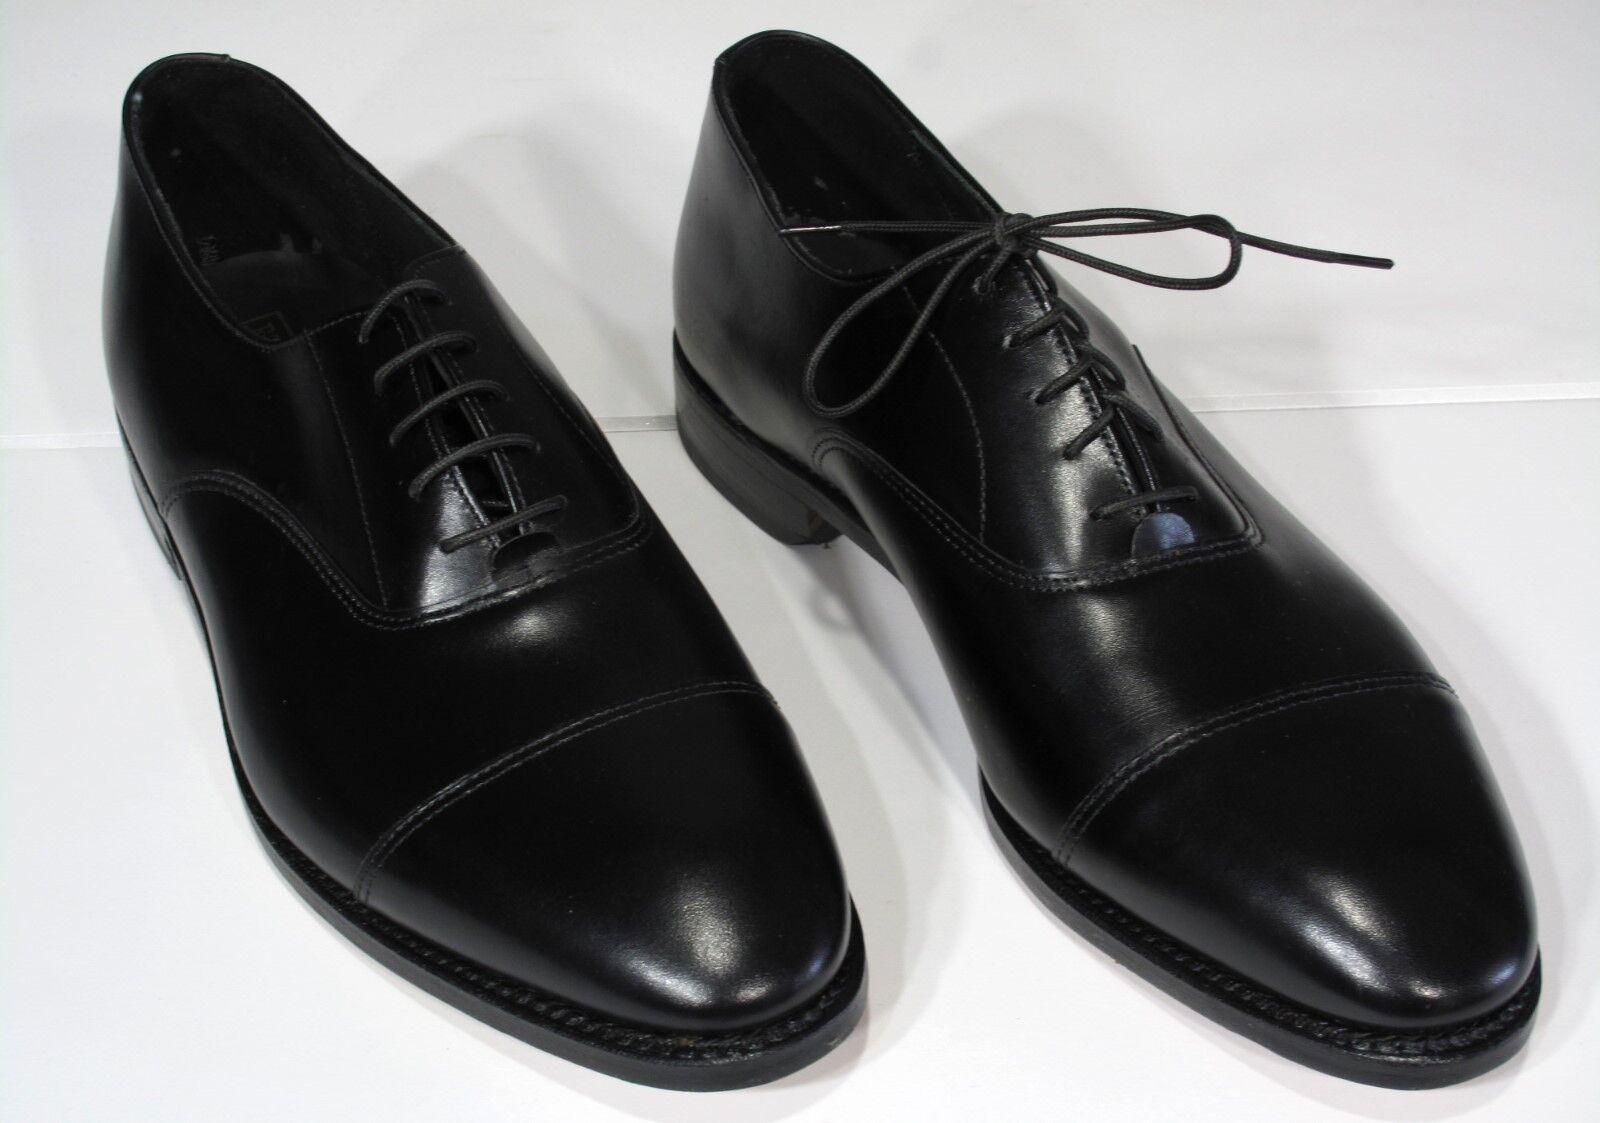 New  ET Wright Cordwainer scarpe 9.5 AA nero Captoe Arch Preserver Goodyear Welt